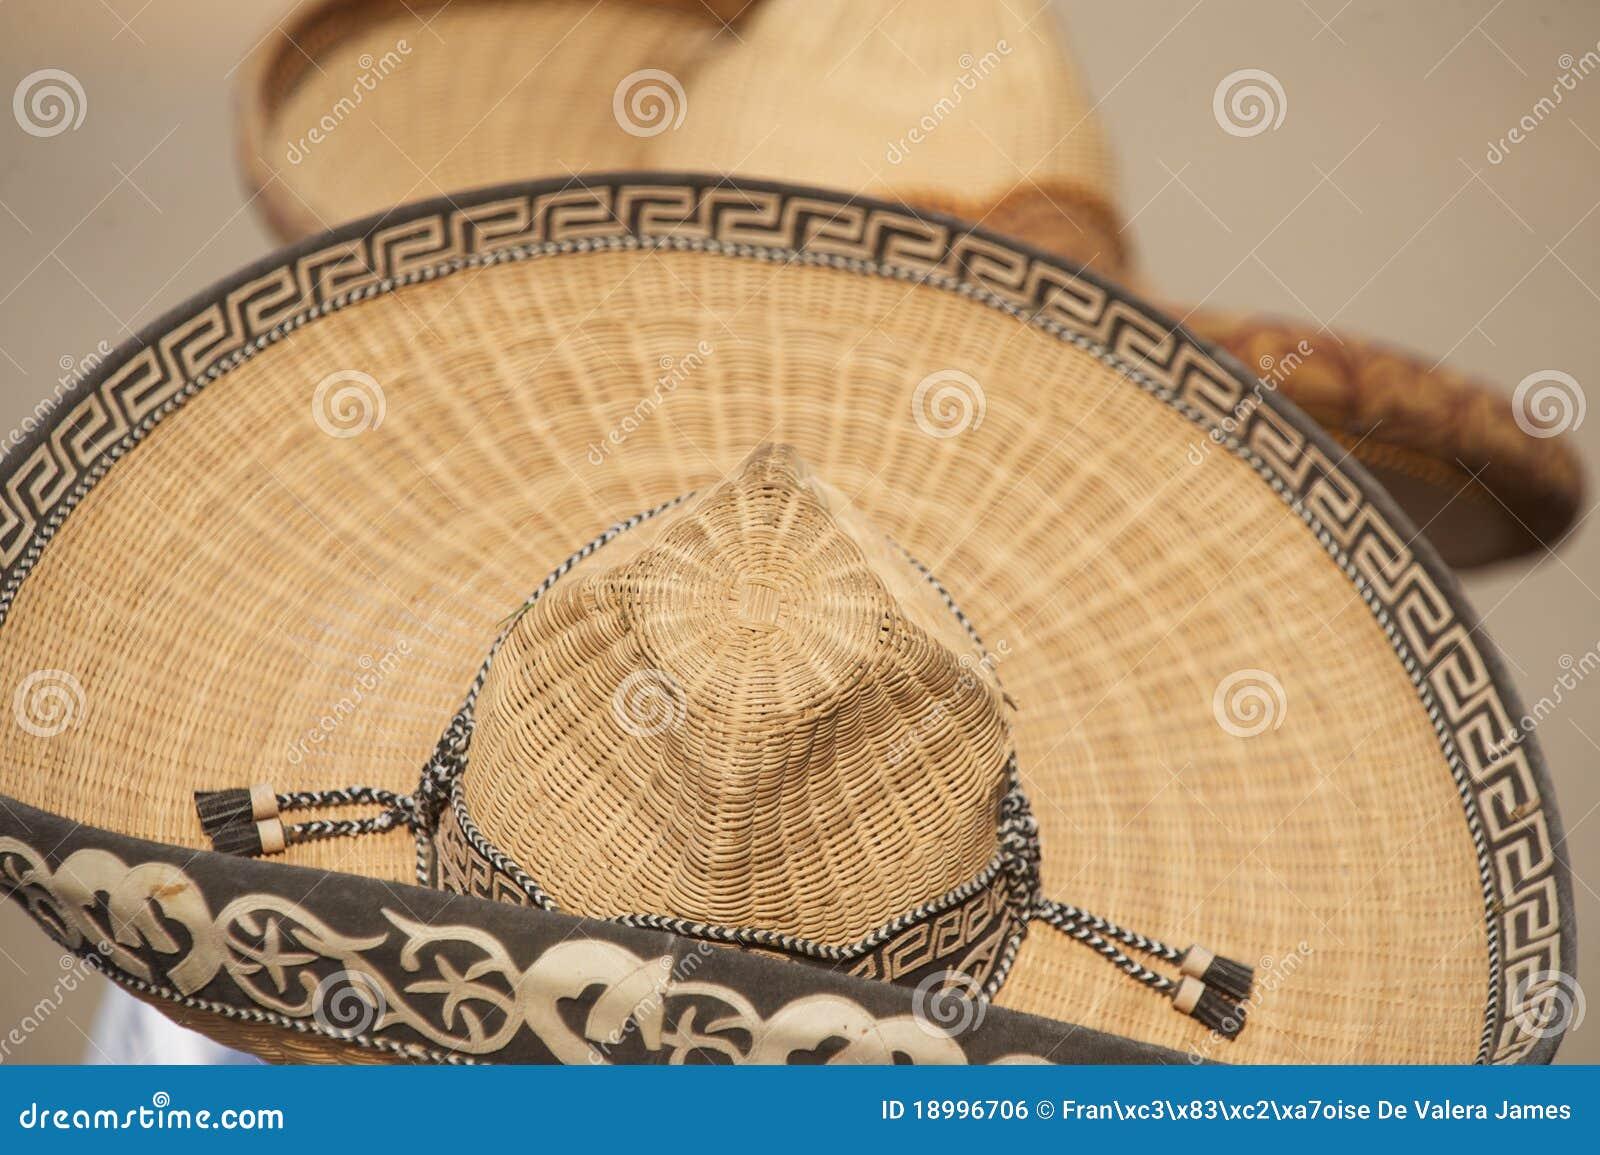 Download Two Mexican Charros Sombreros, TX, US Stock Photo - Image of sombreros, tassles: 18996706